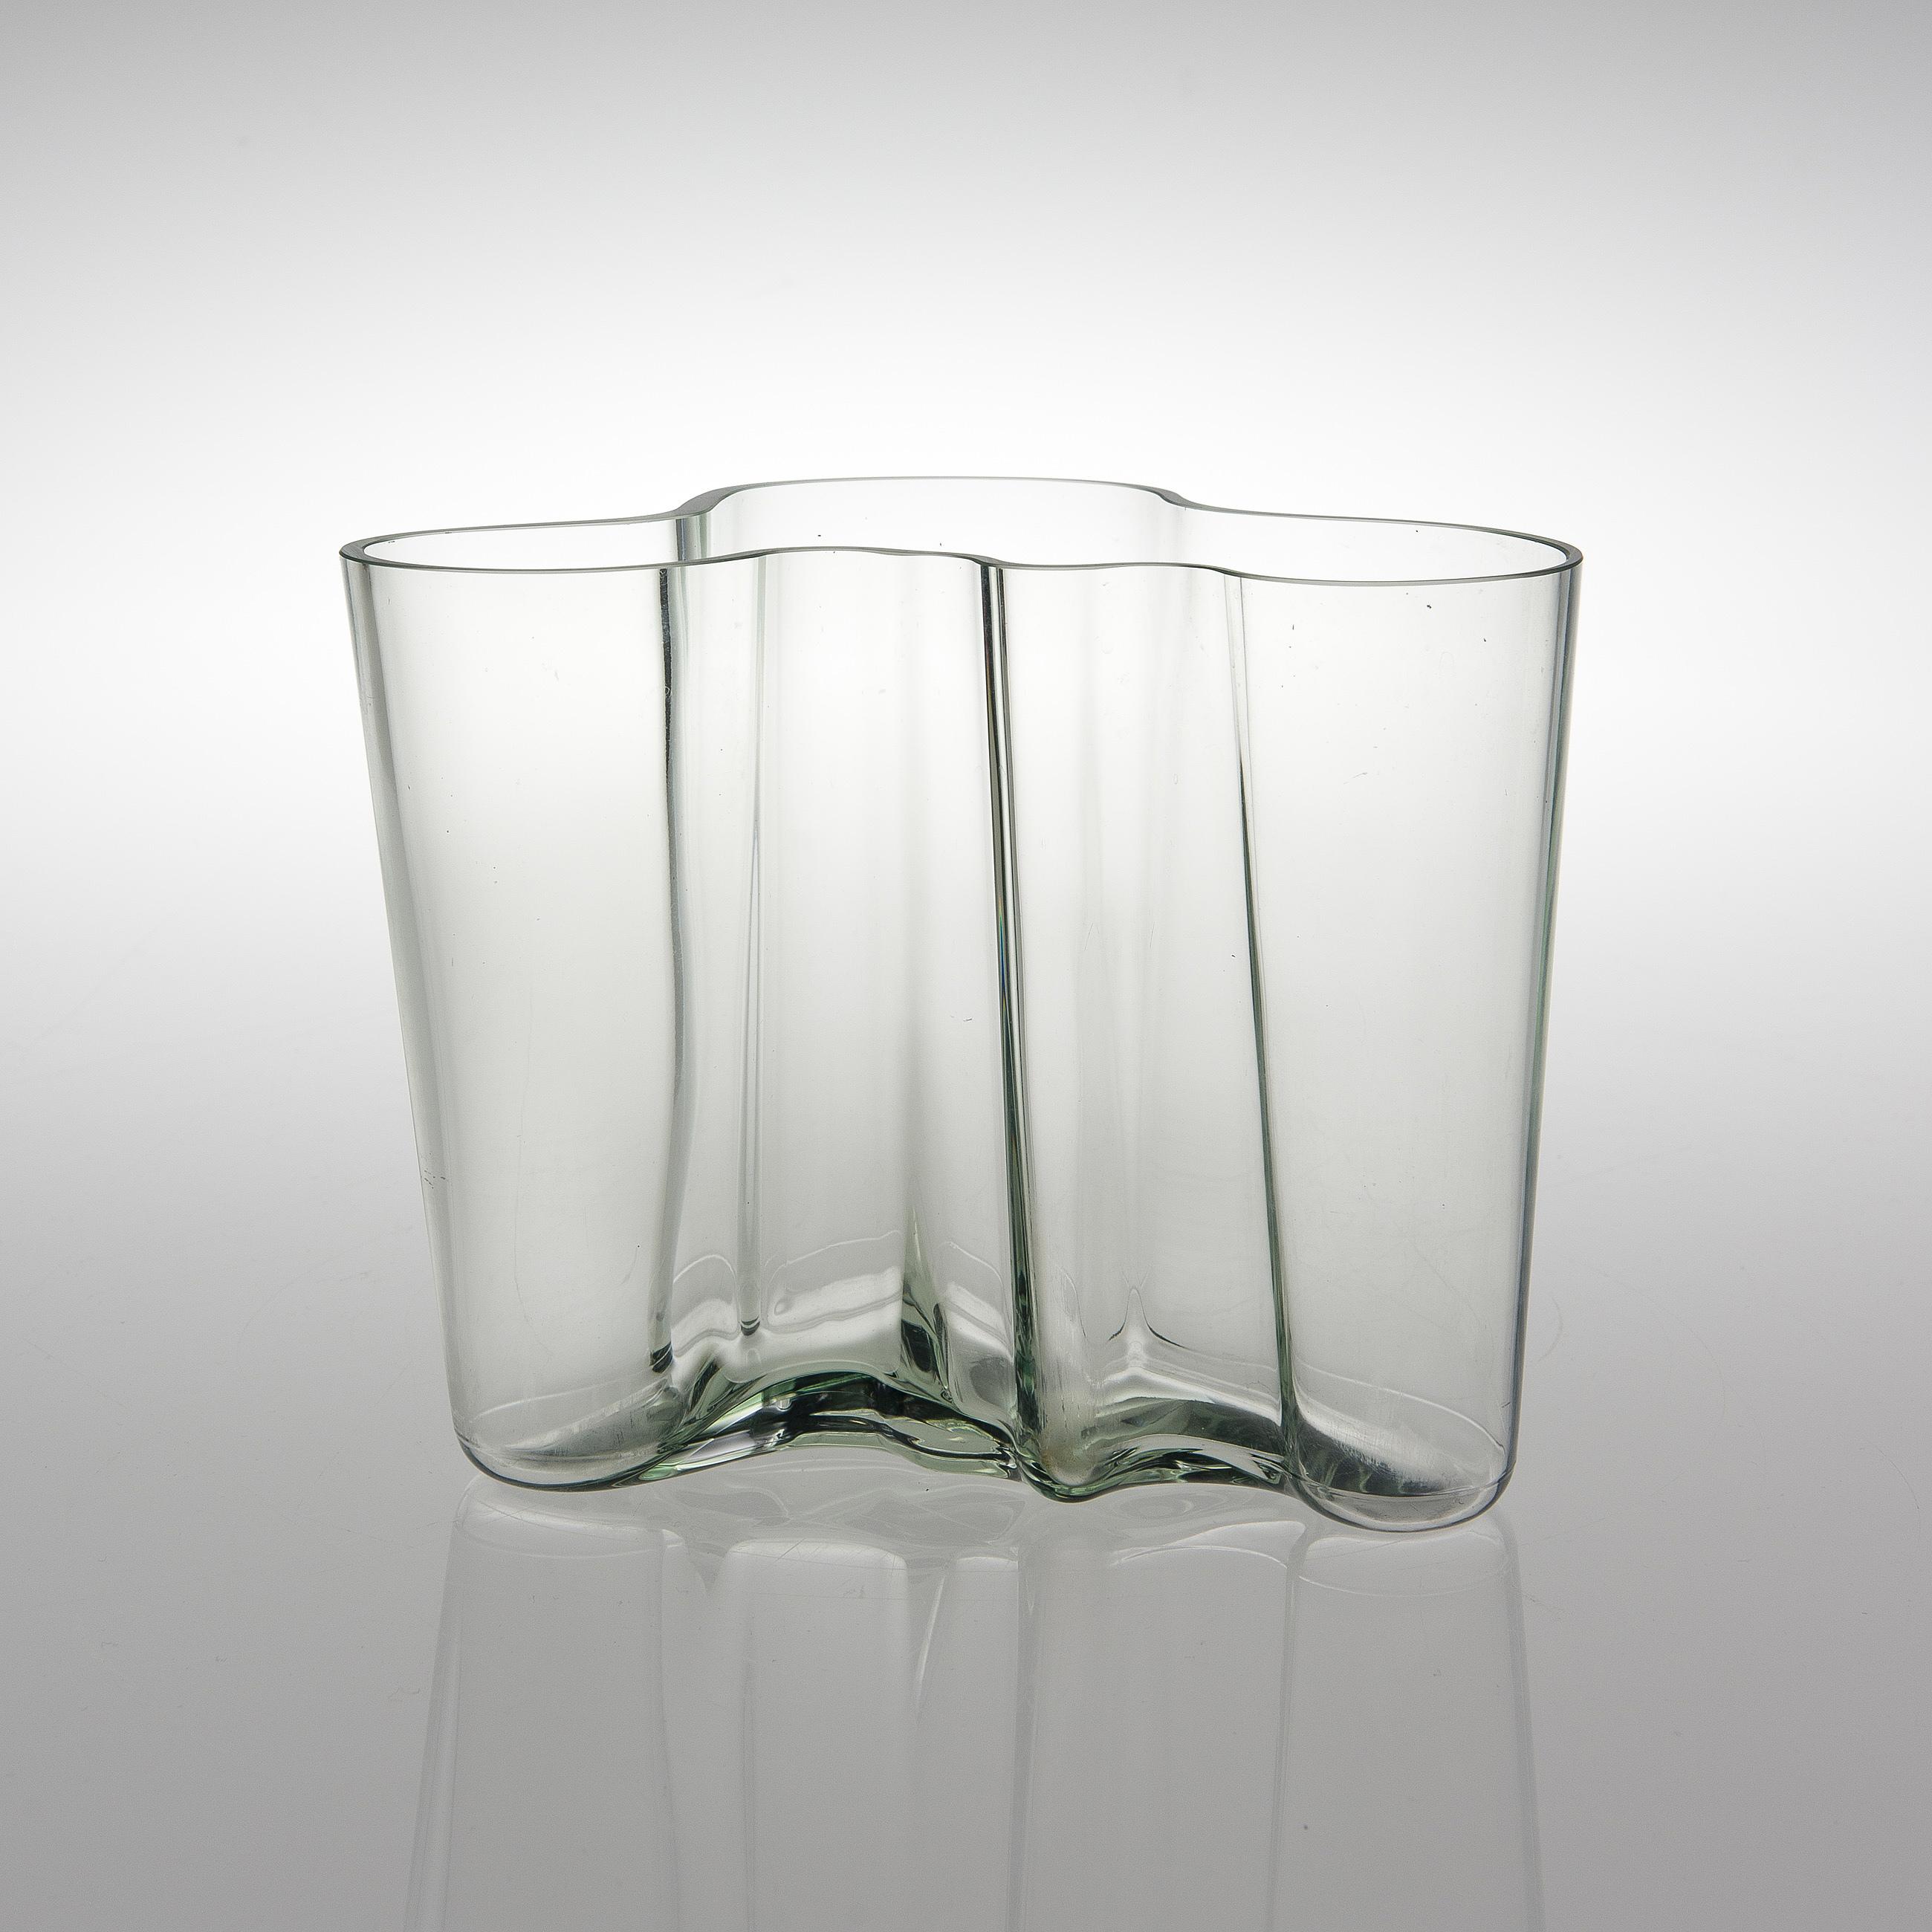 Alvar aalto a savoy glass vase marked alvar aalto 100 iittala 10252044 bukobject reviewsmspy